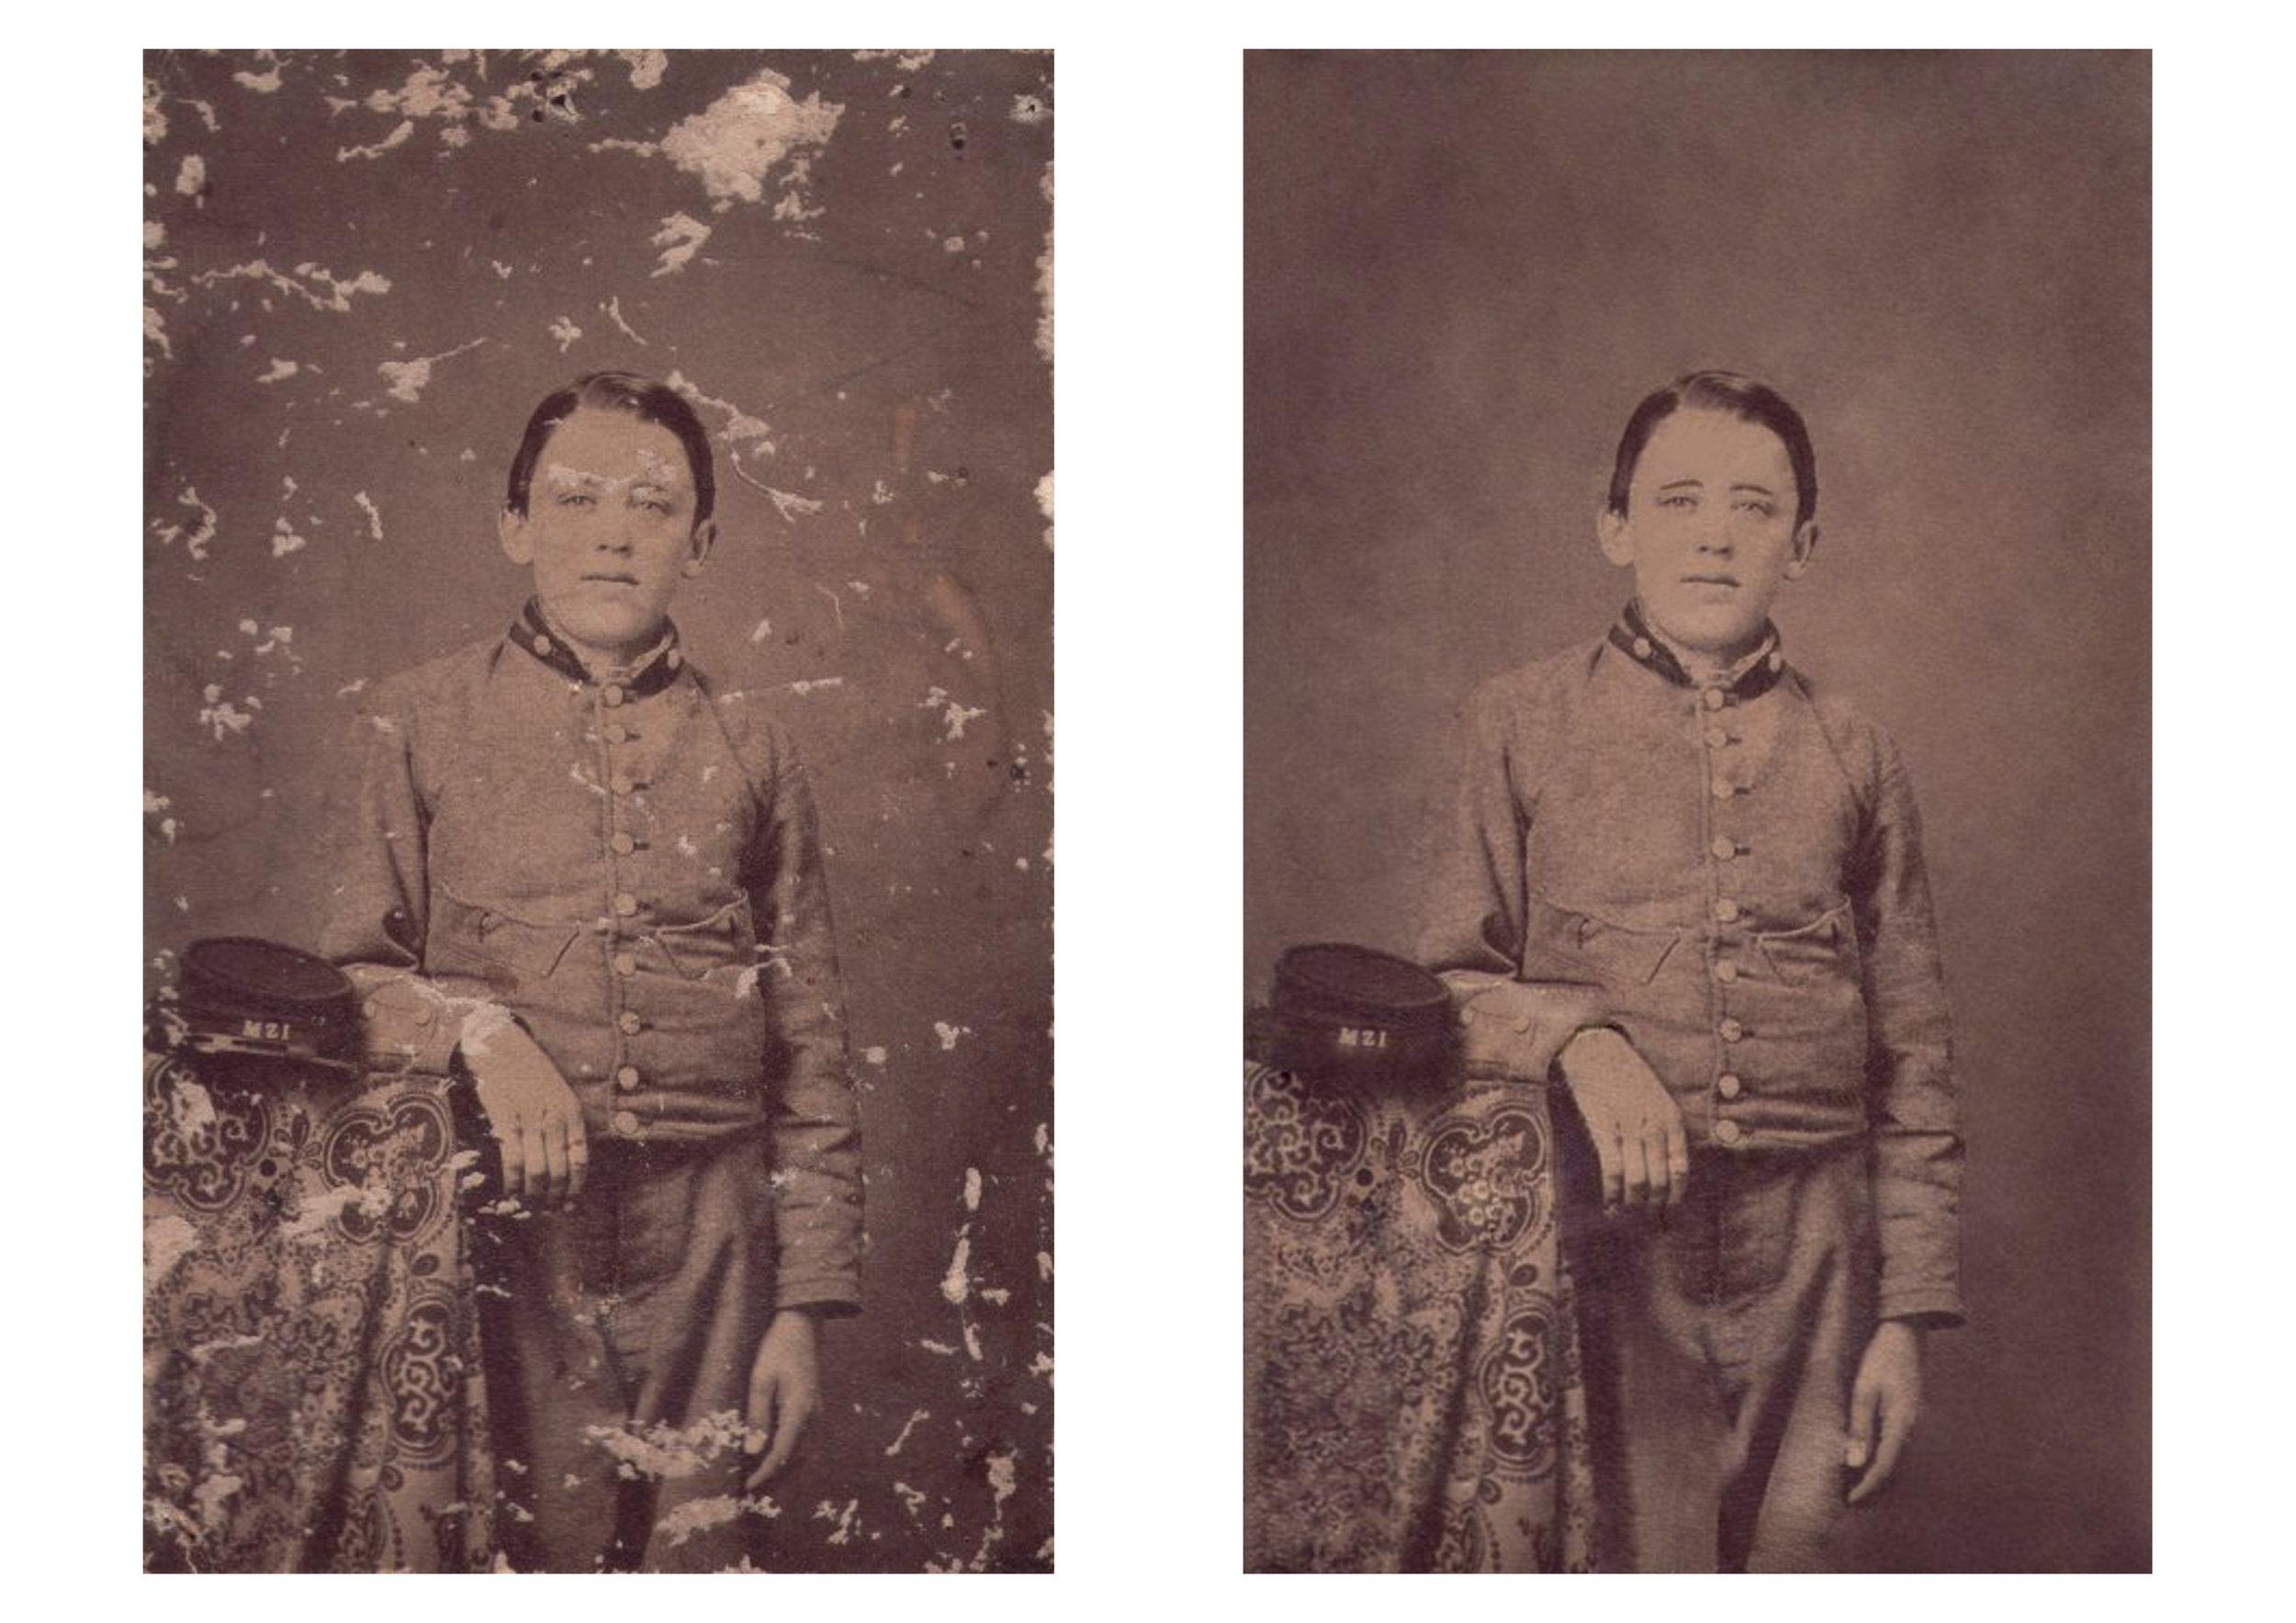 Title: Retouching Family Photo Year: 2012 Medium:Archival Pigment Print